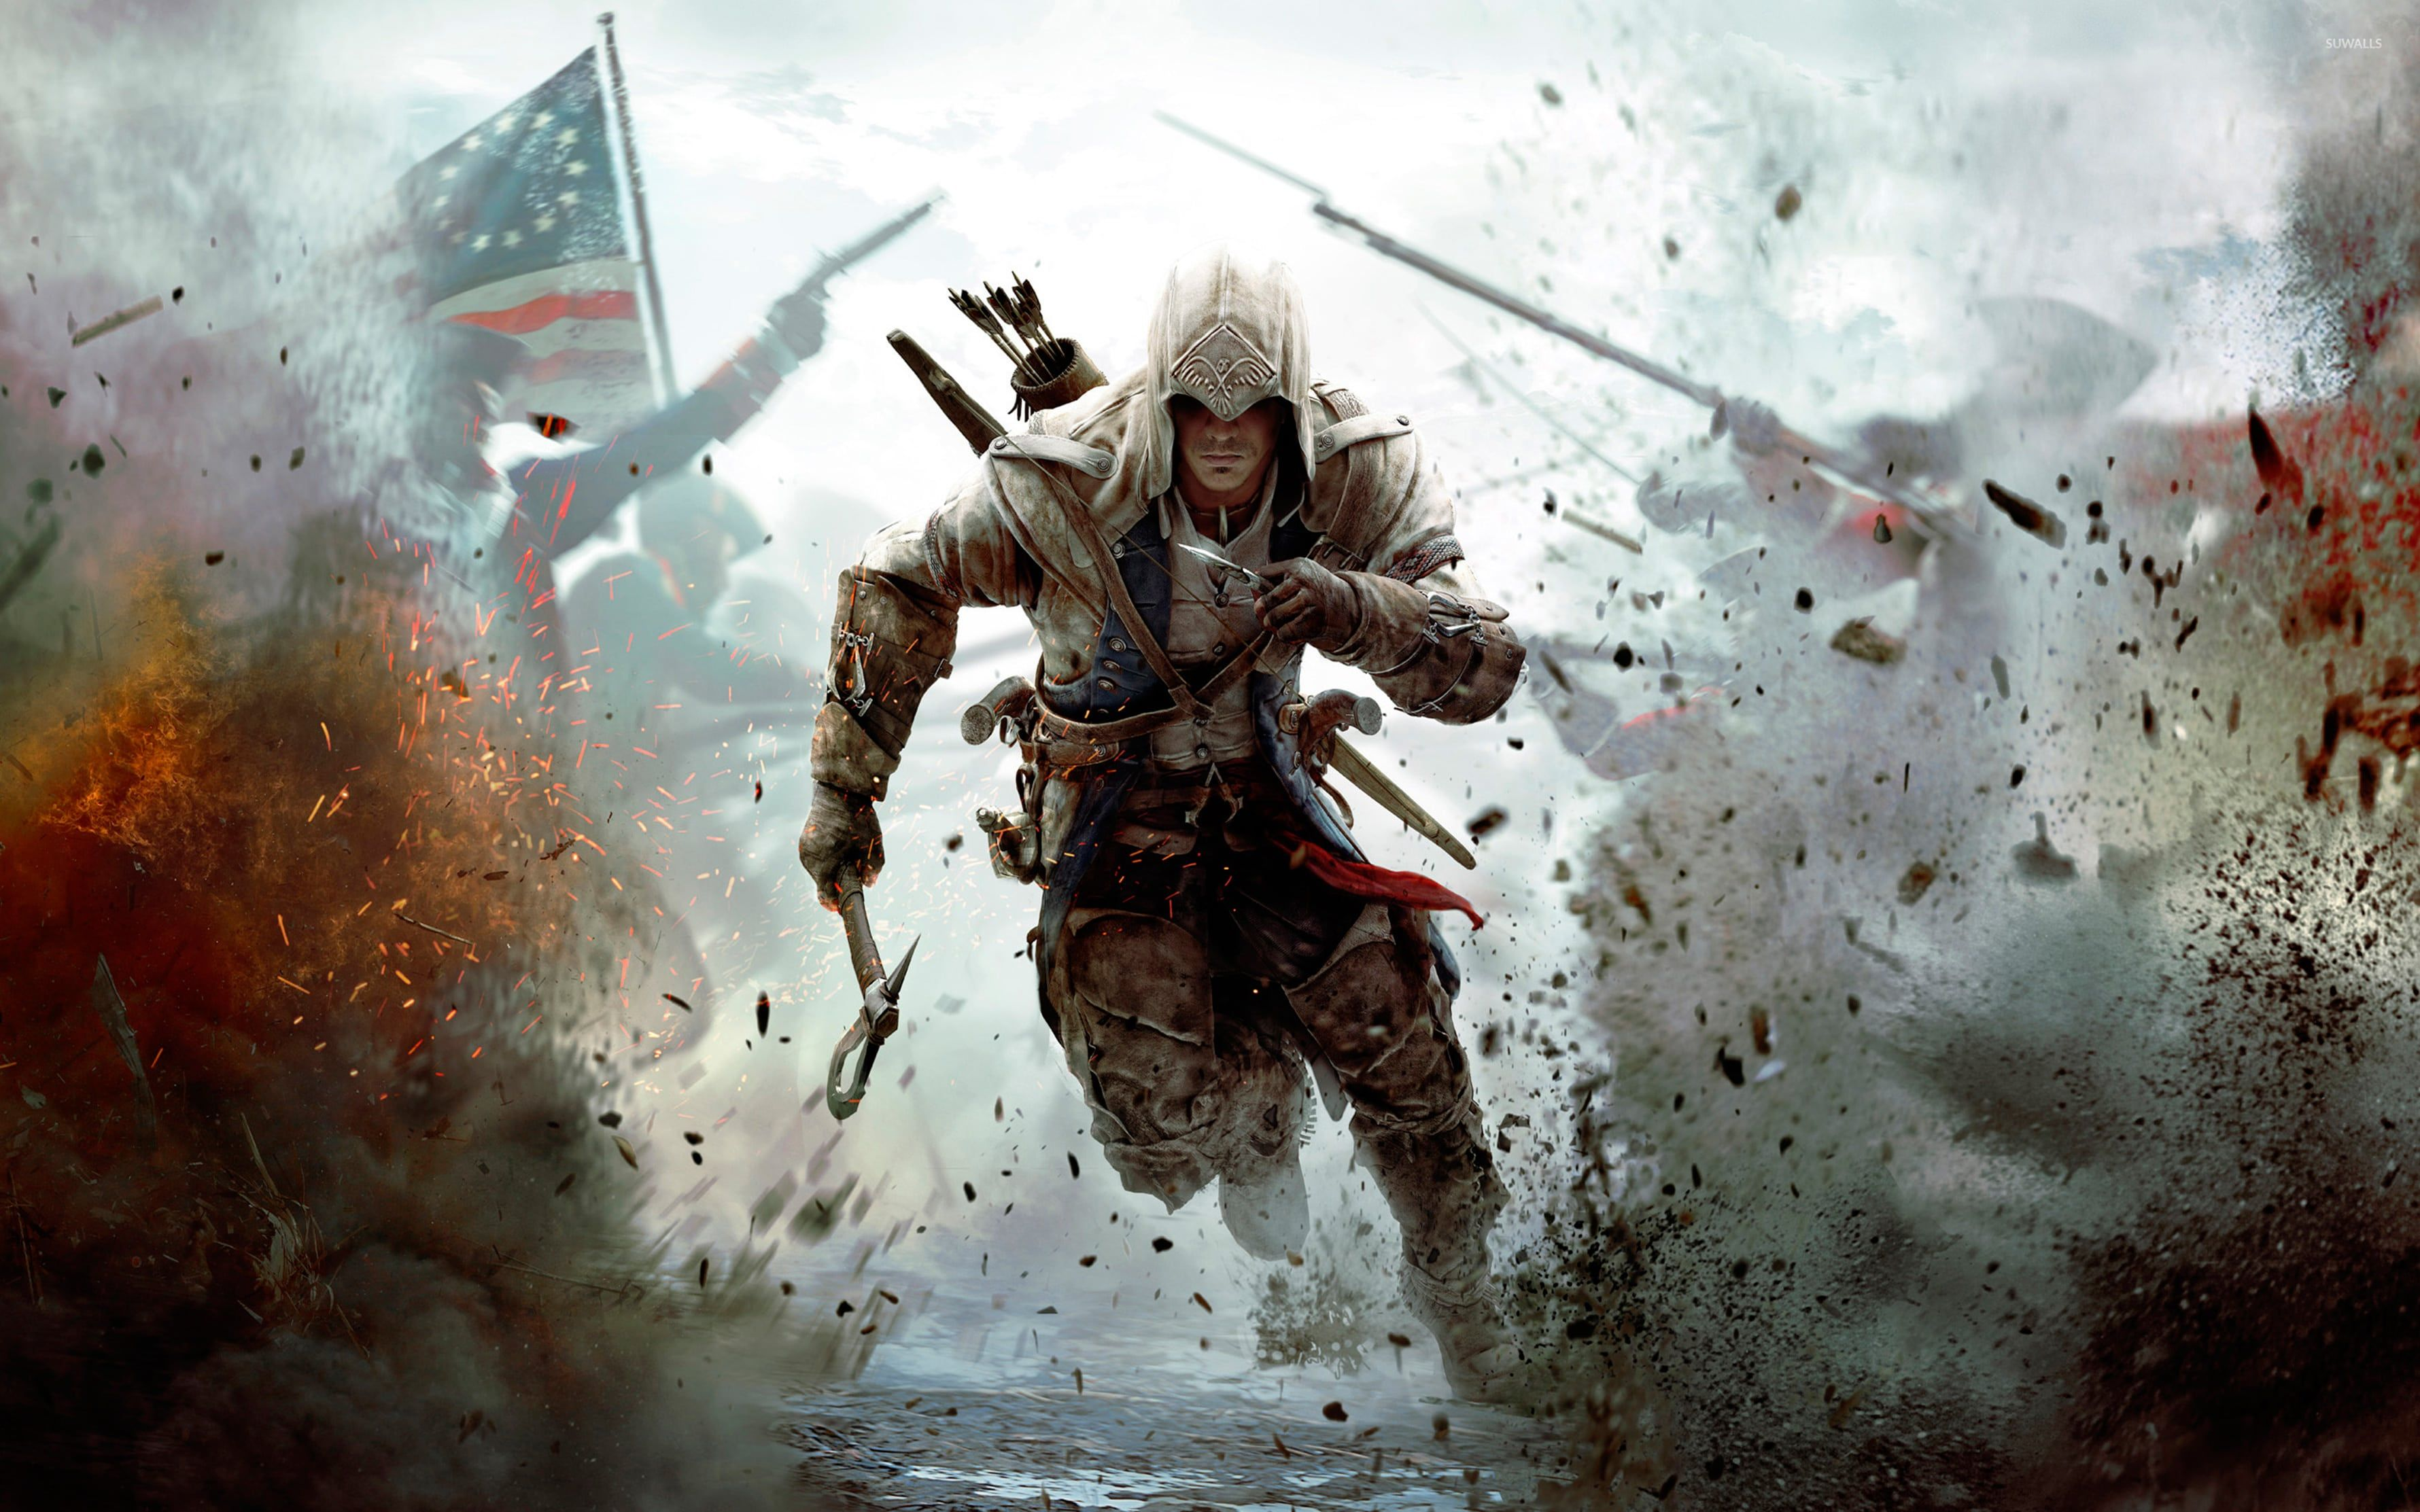 New Assassin S Creed 4k Desktop Wallpaper Size 3560 2225 Assassin S Creed Wallpaper Assassins Creed Logo Assassins Creed 3